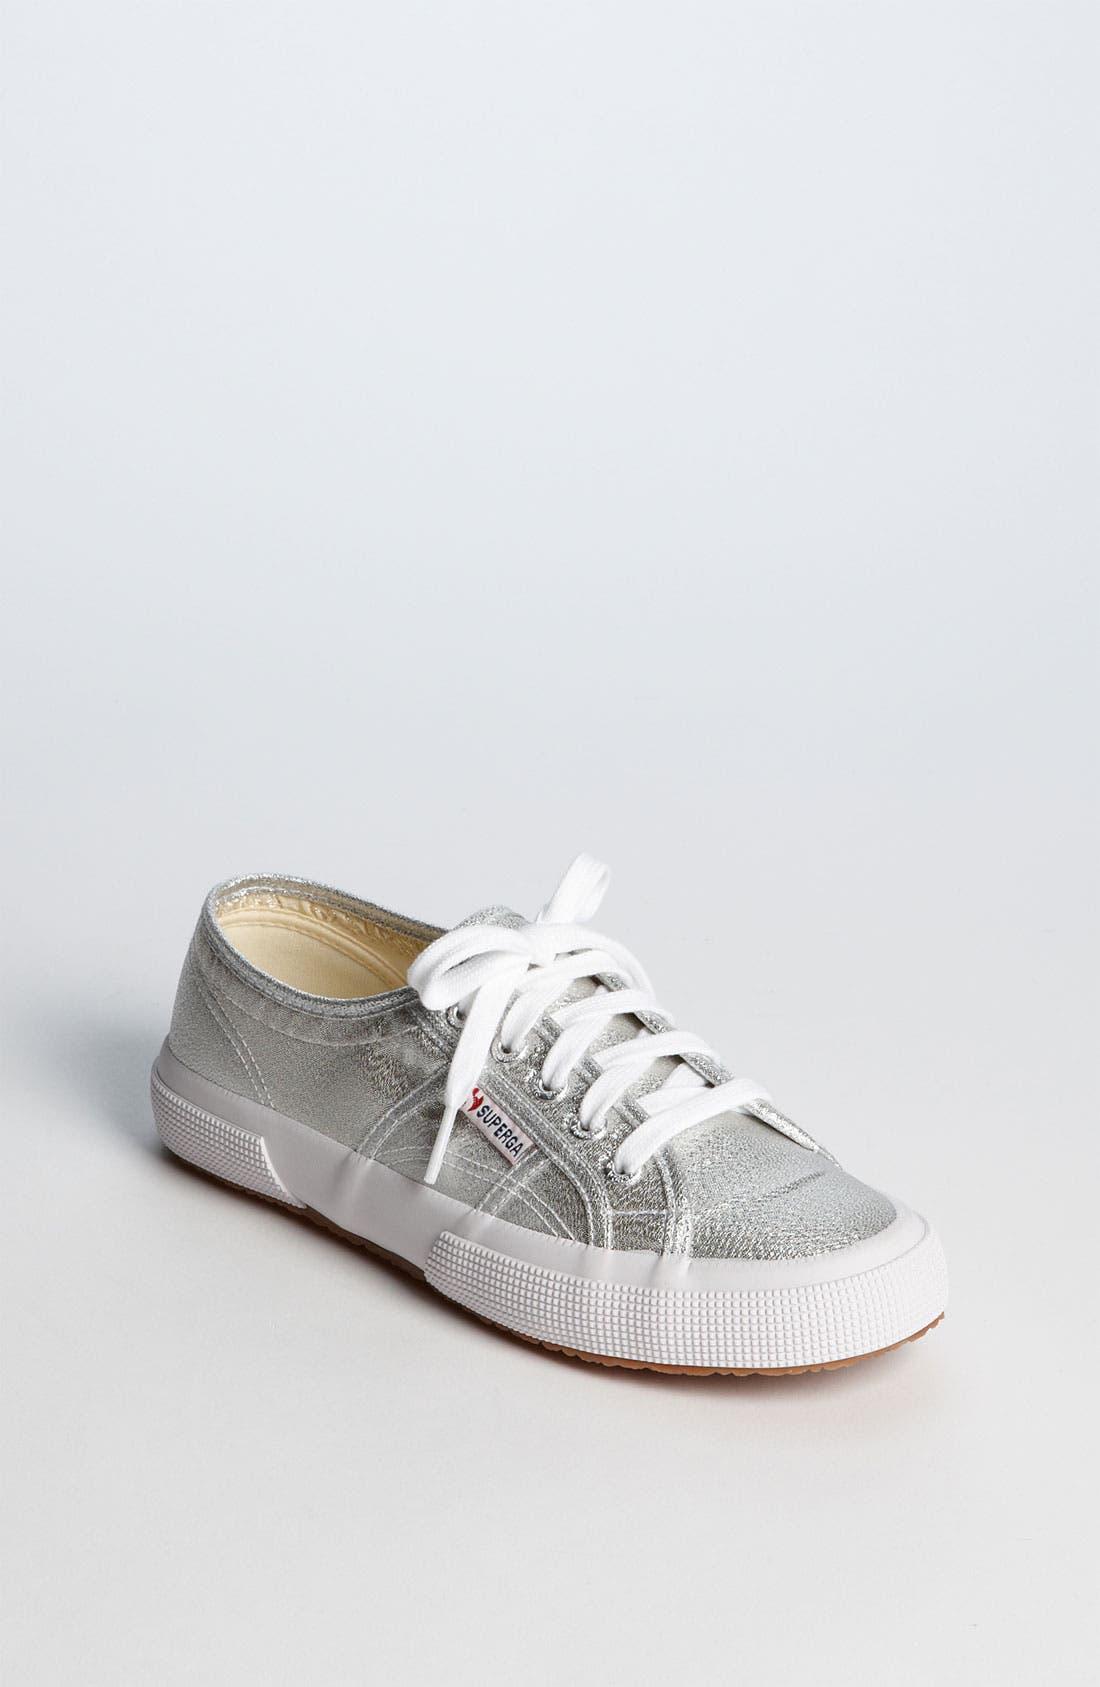 Alternate Image 1 Selected - Superga 'Lamé' Sneaker